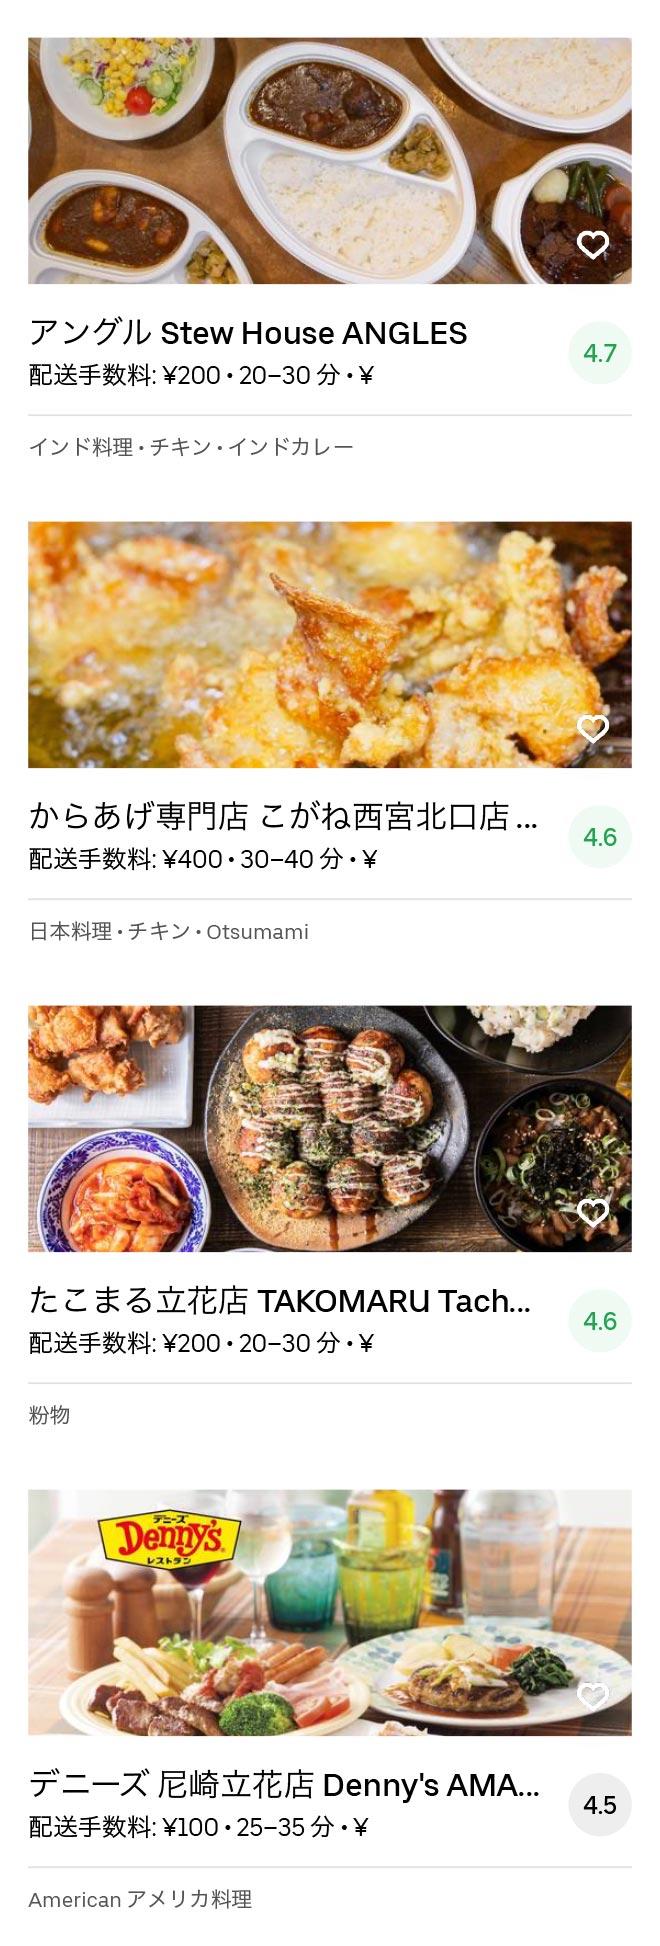 Amagasaki mukonosou menu 2005 08